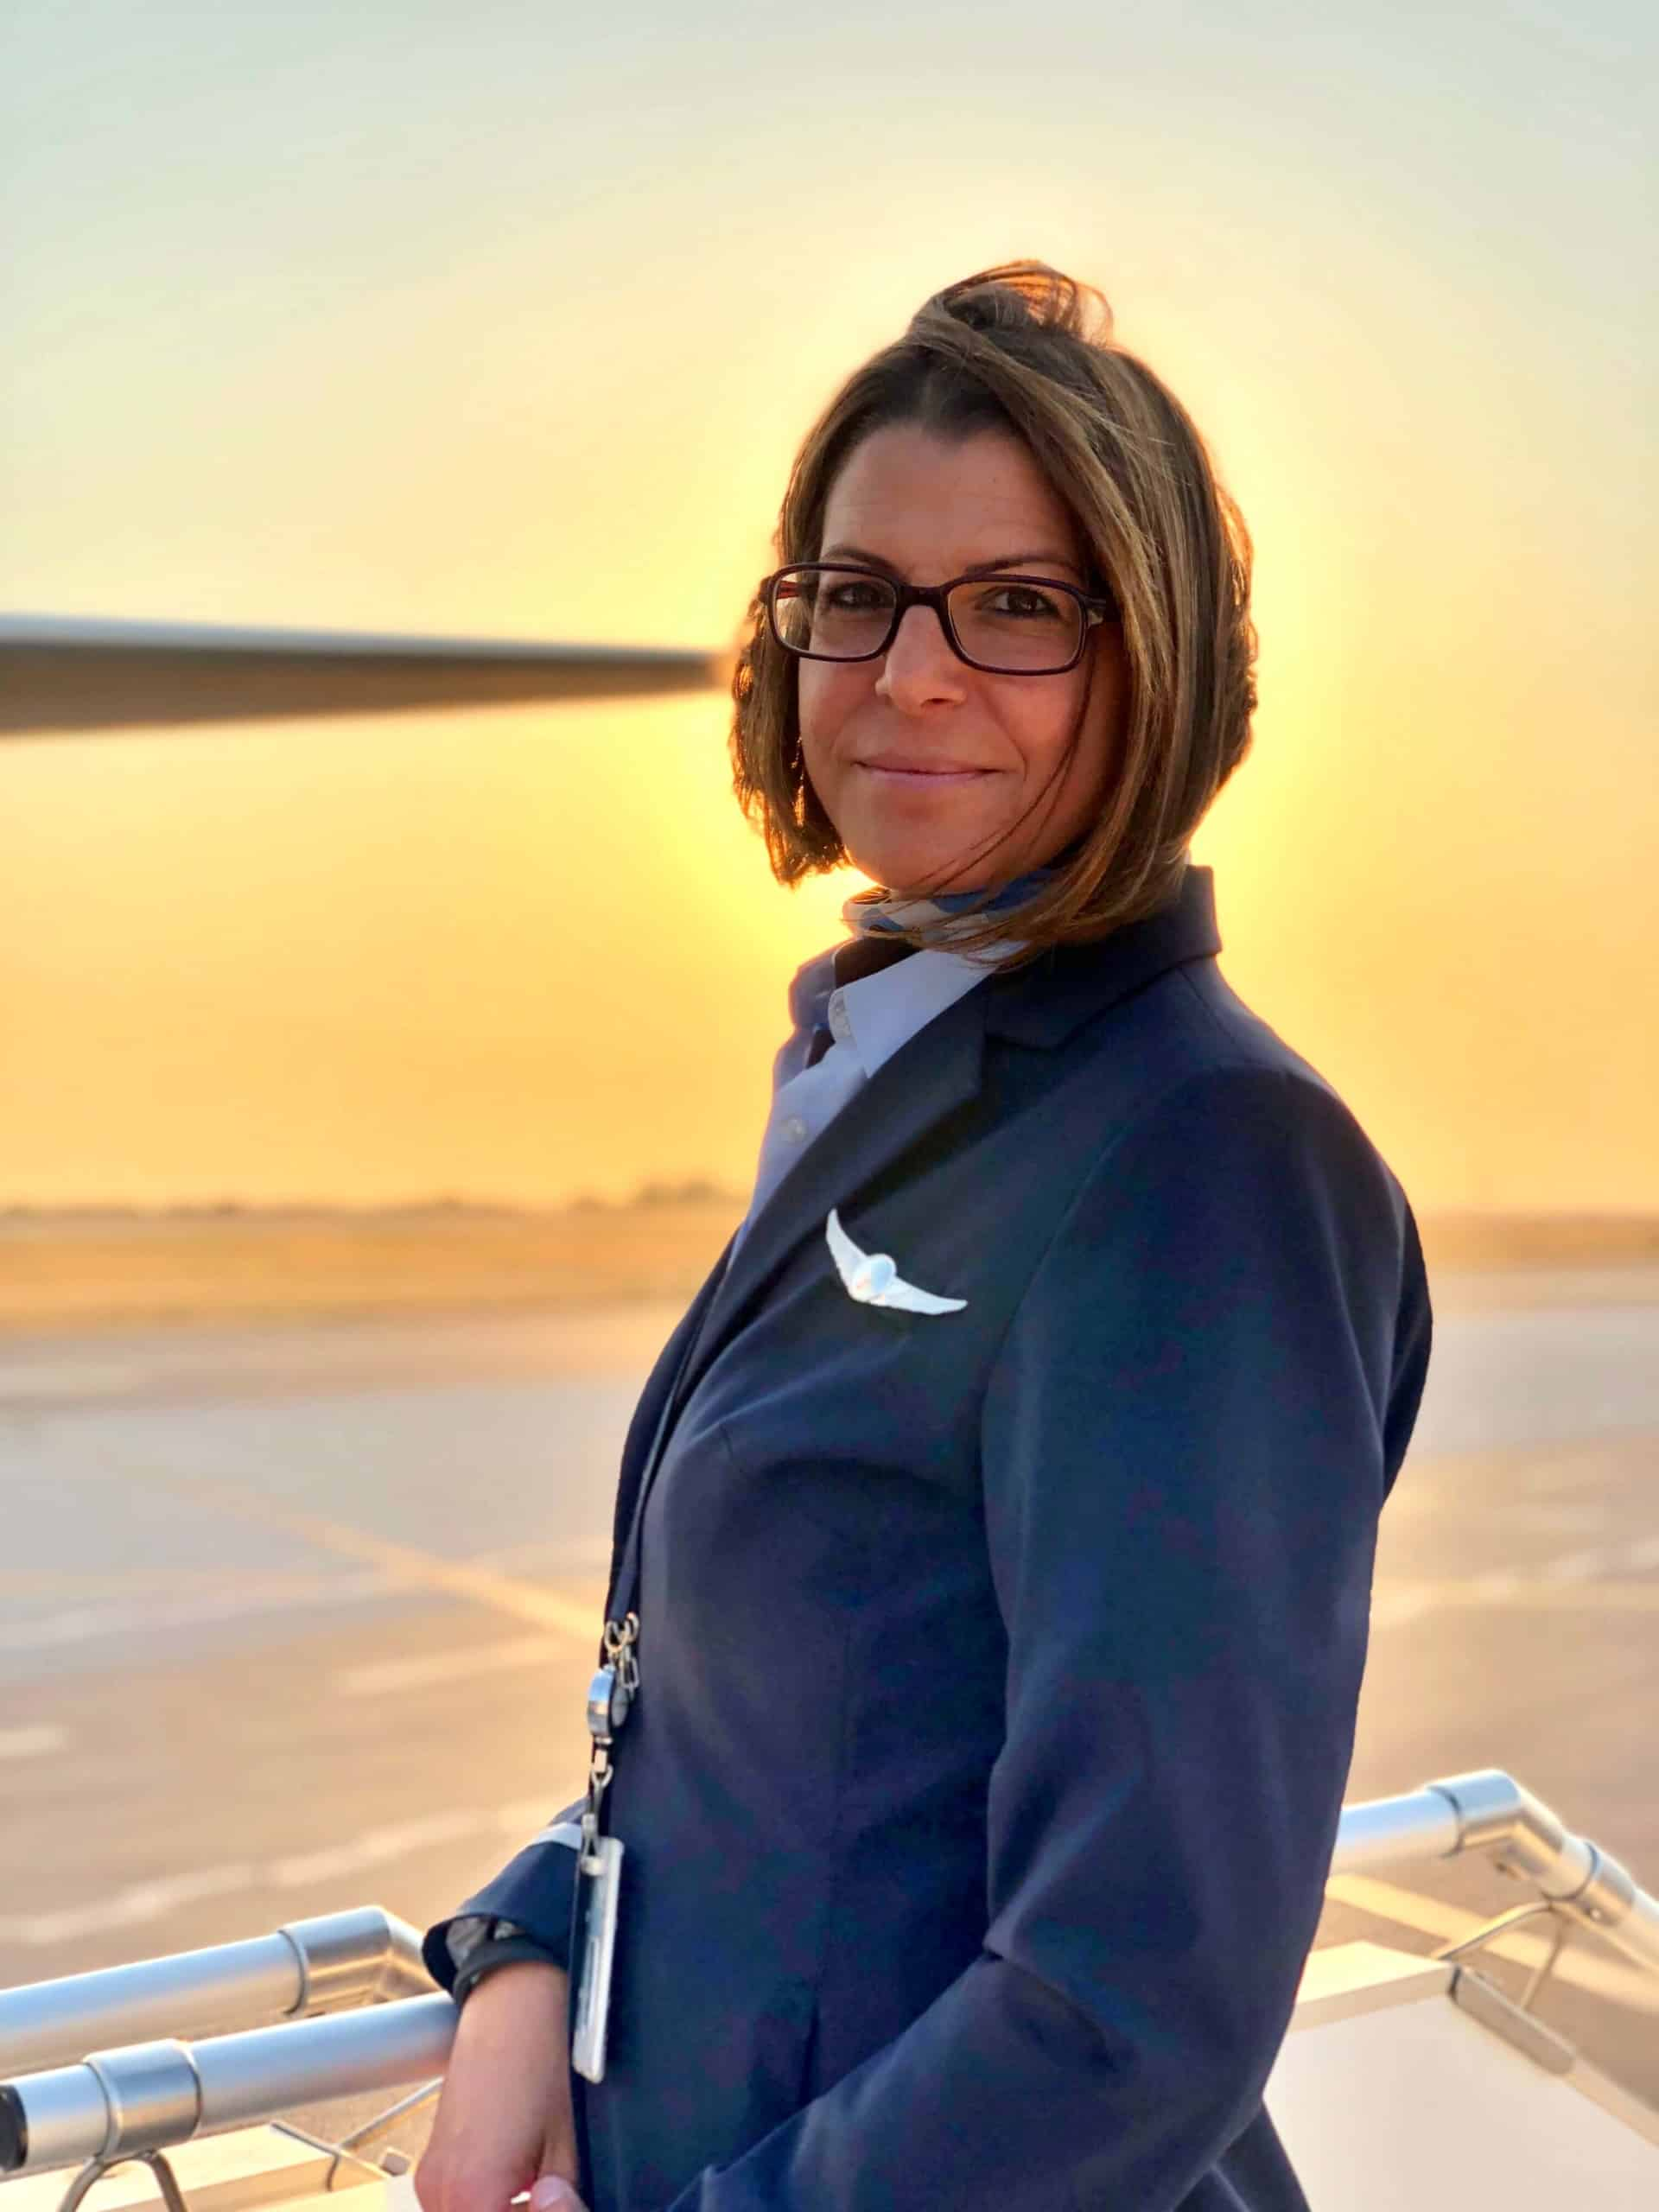 Rosa Flugbegleiterin TUI fly Instagram-Profil @flight.level360